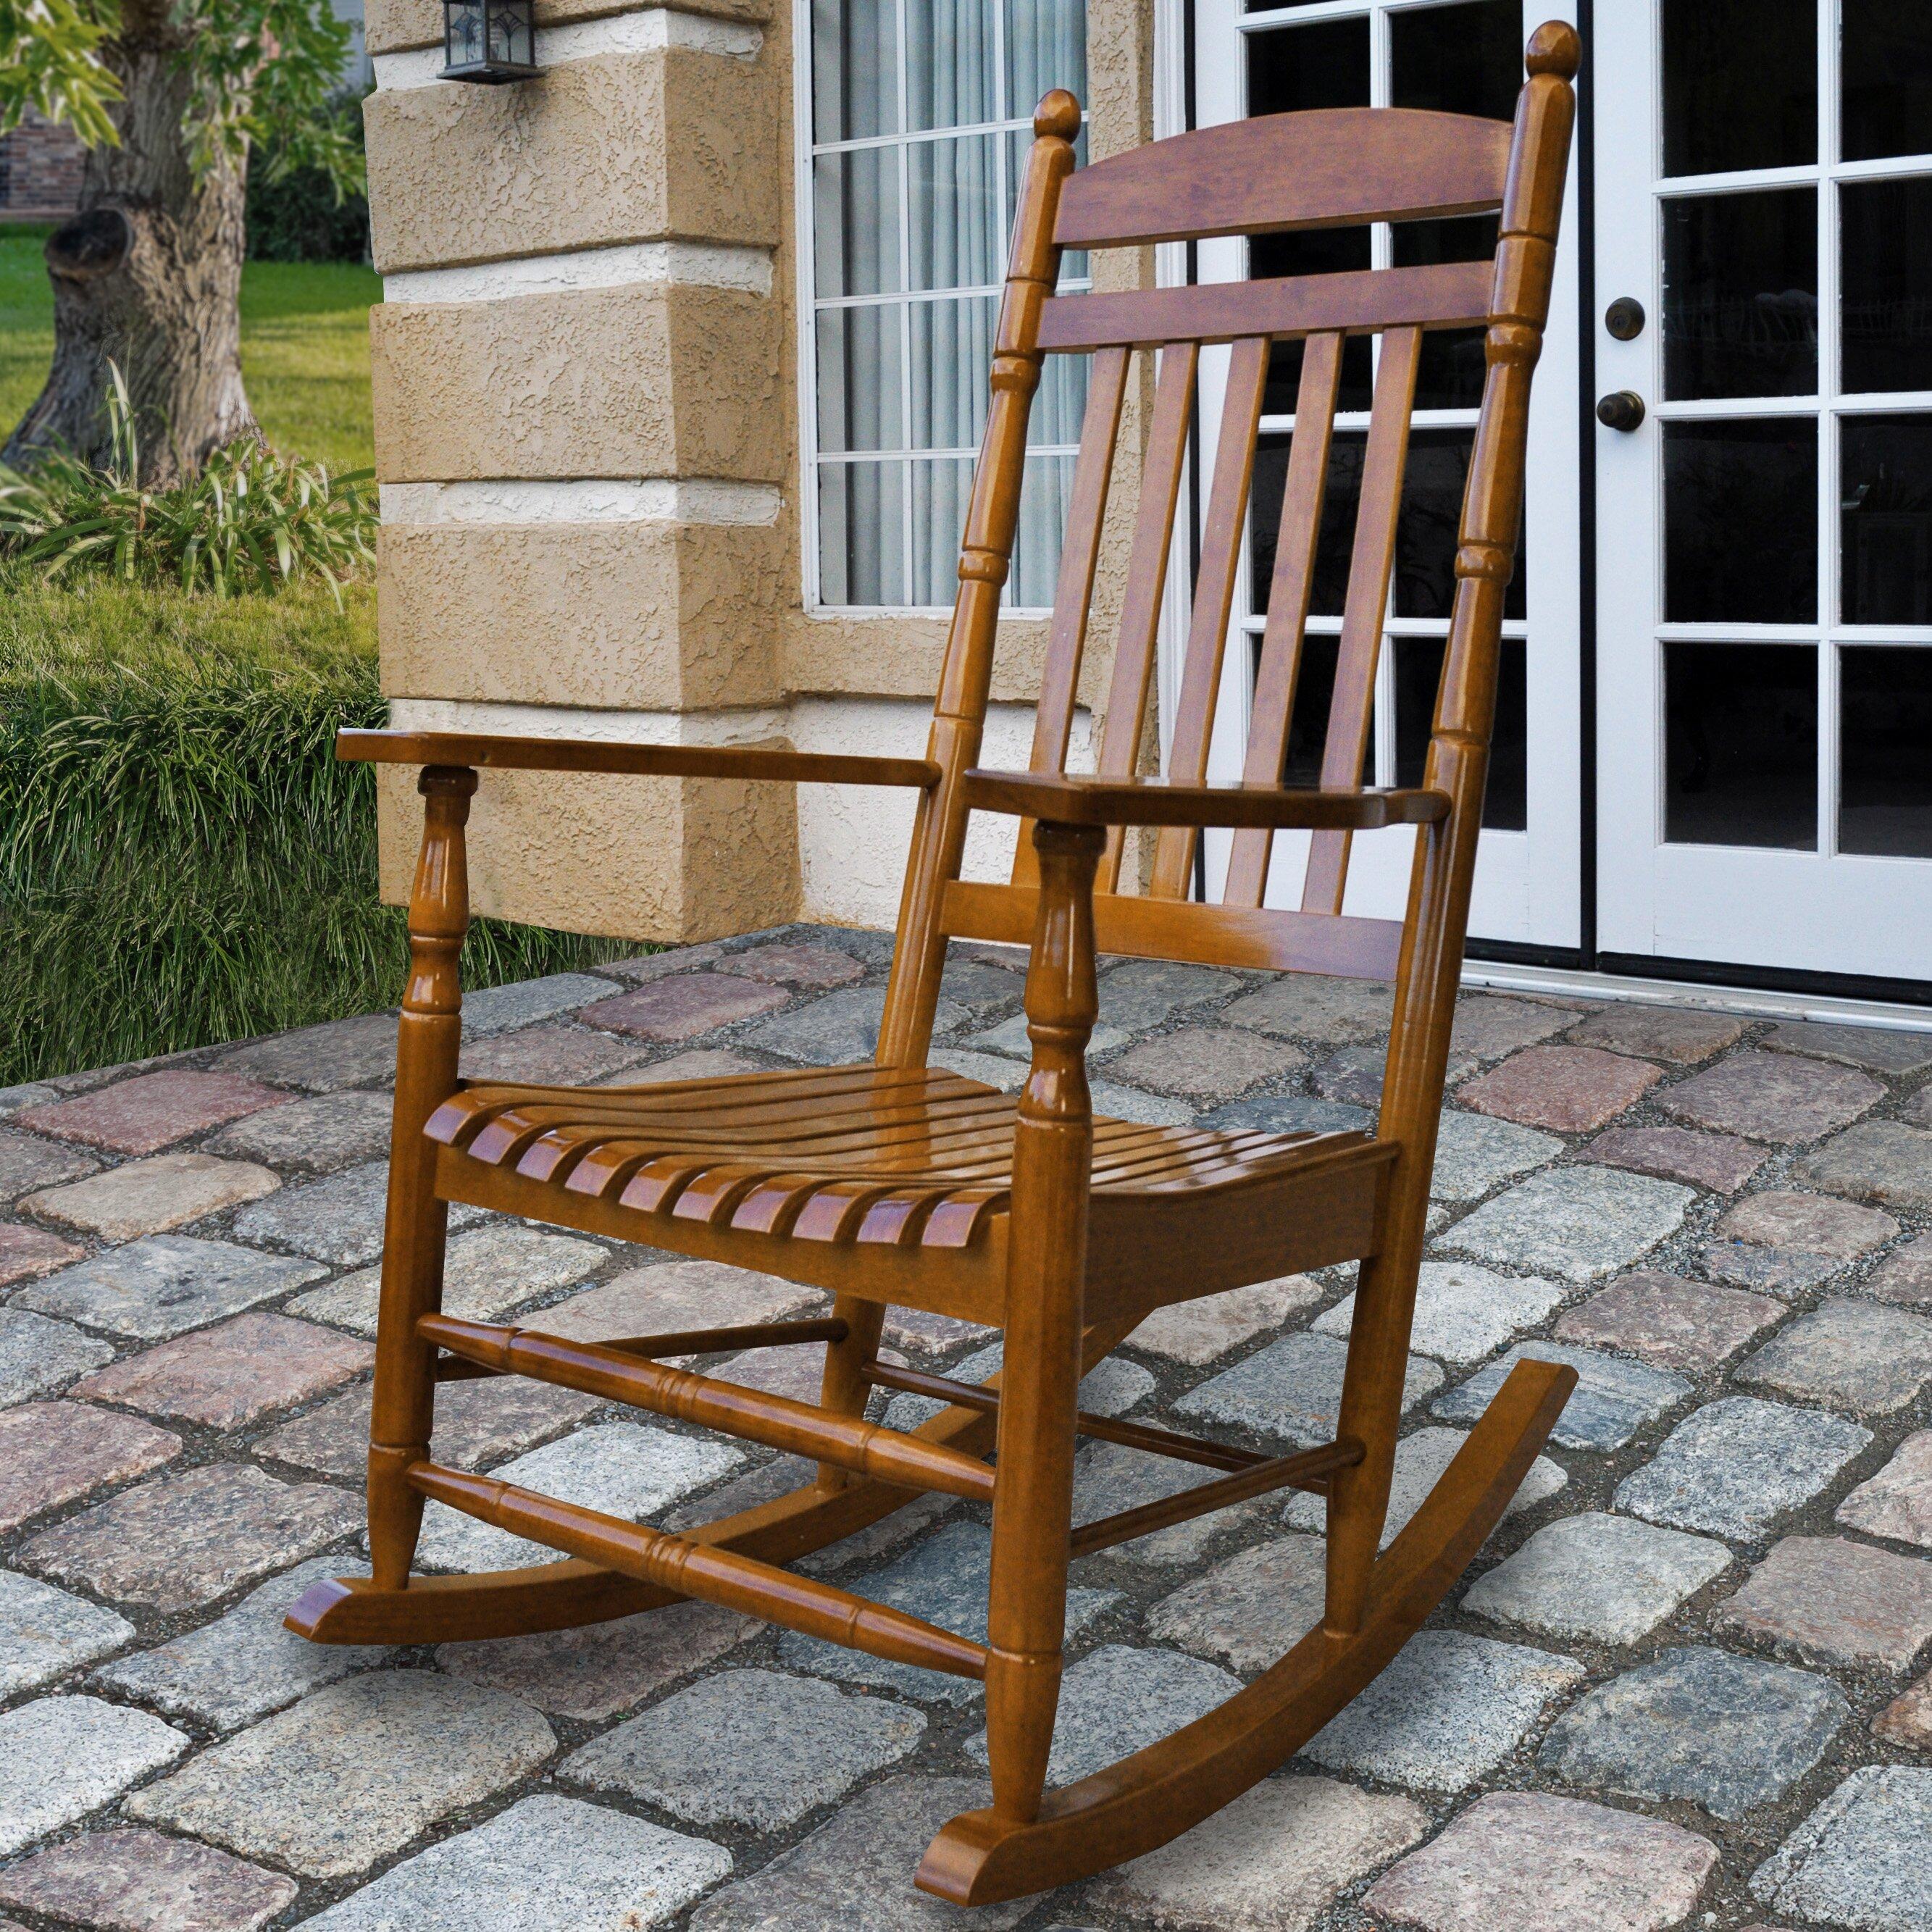 Shine Company Inc. Rhode Island Porch Rocker Chair & Reviews  Wayfair